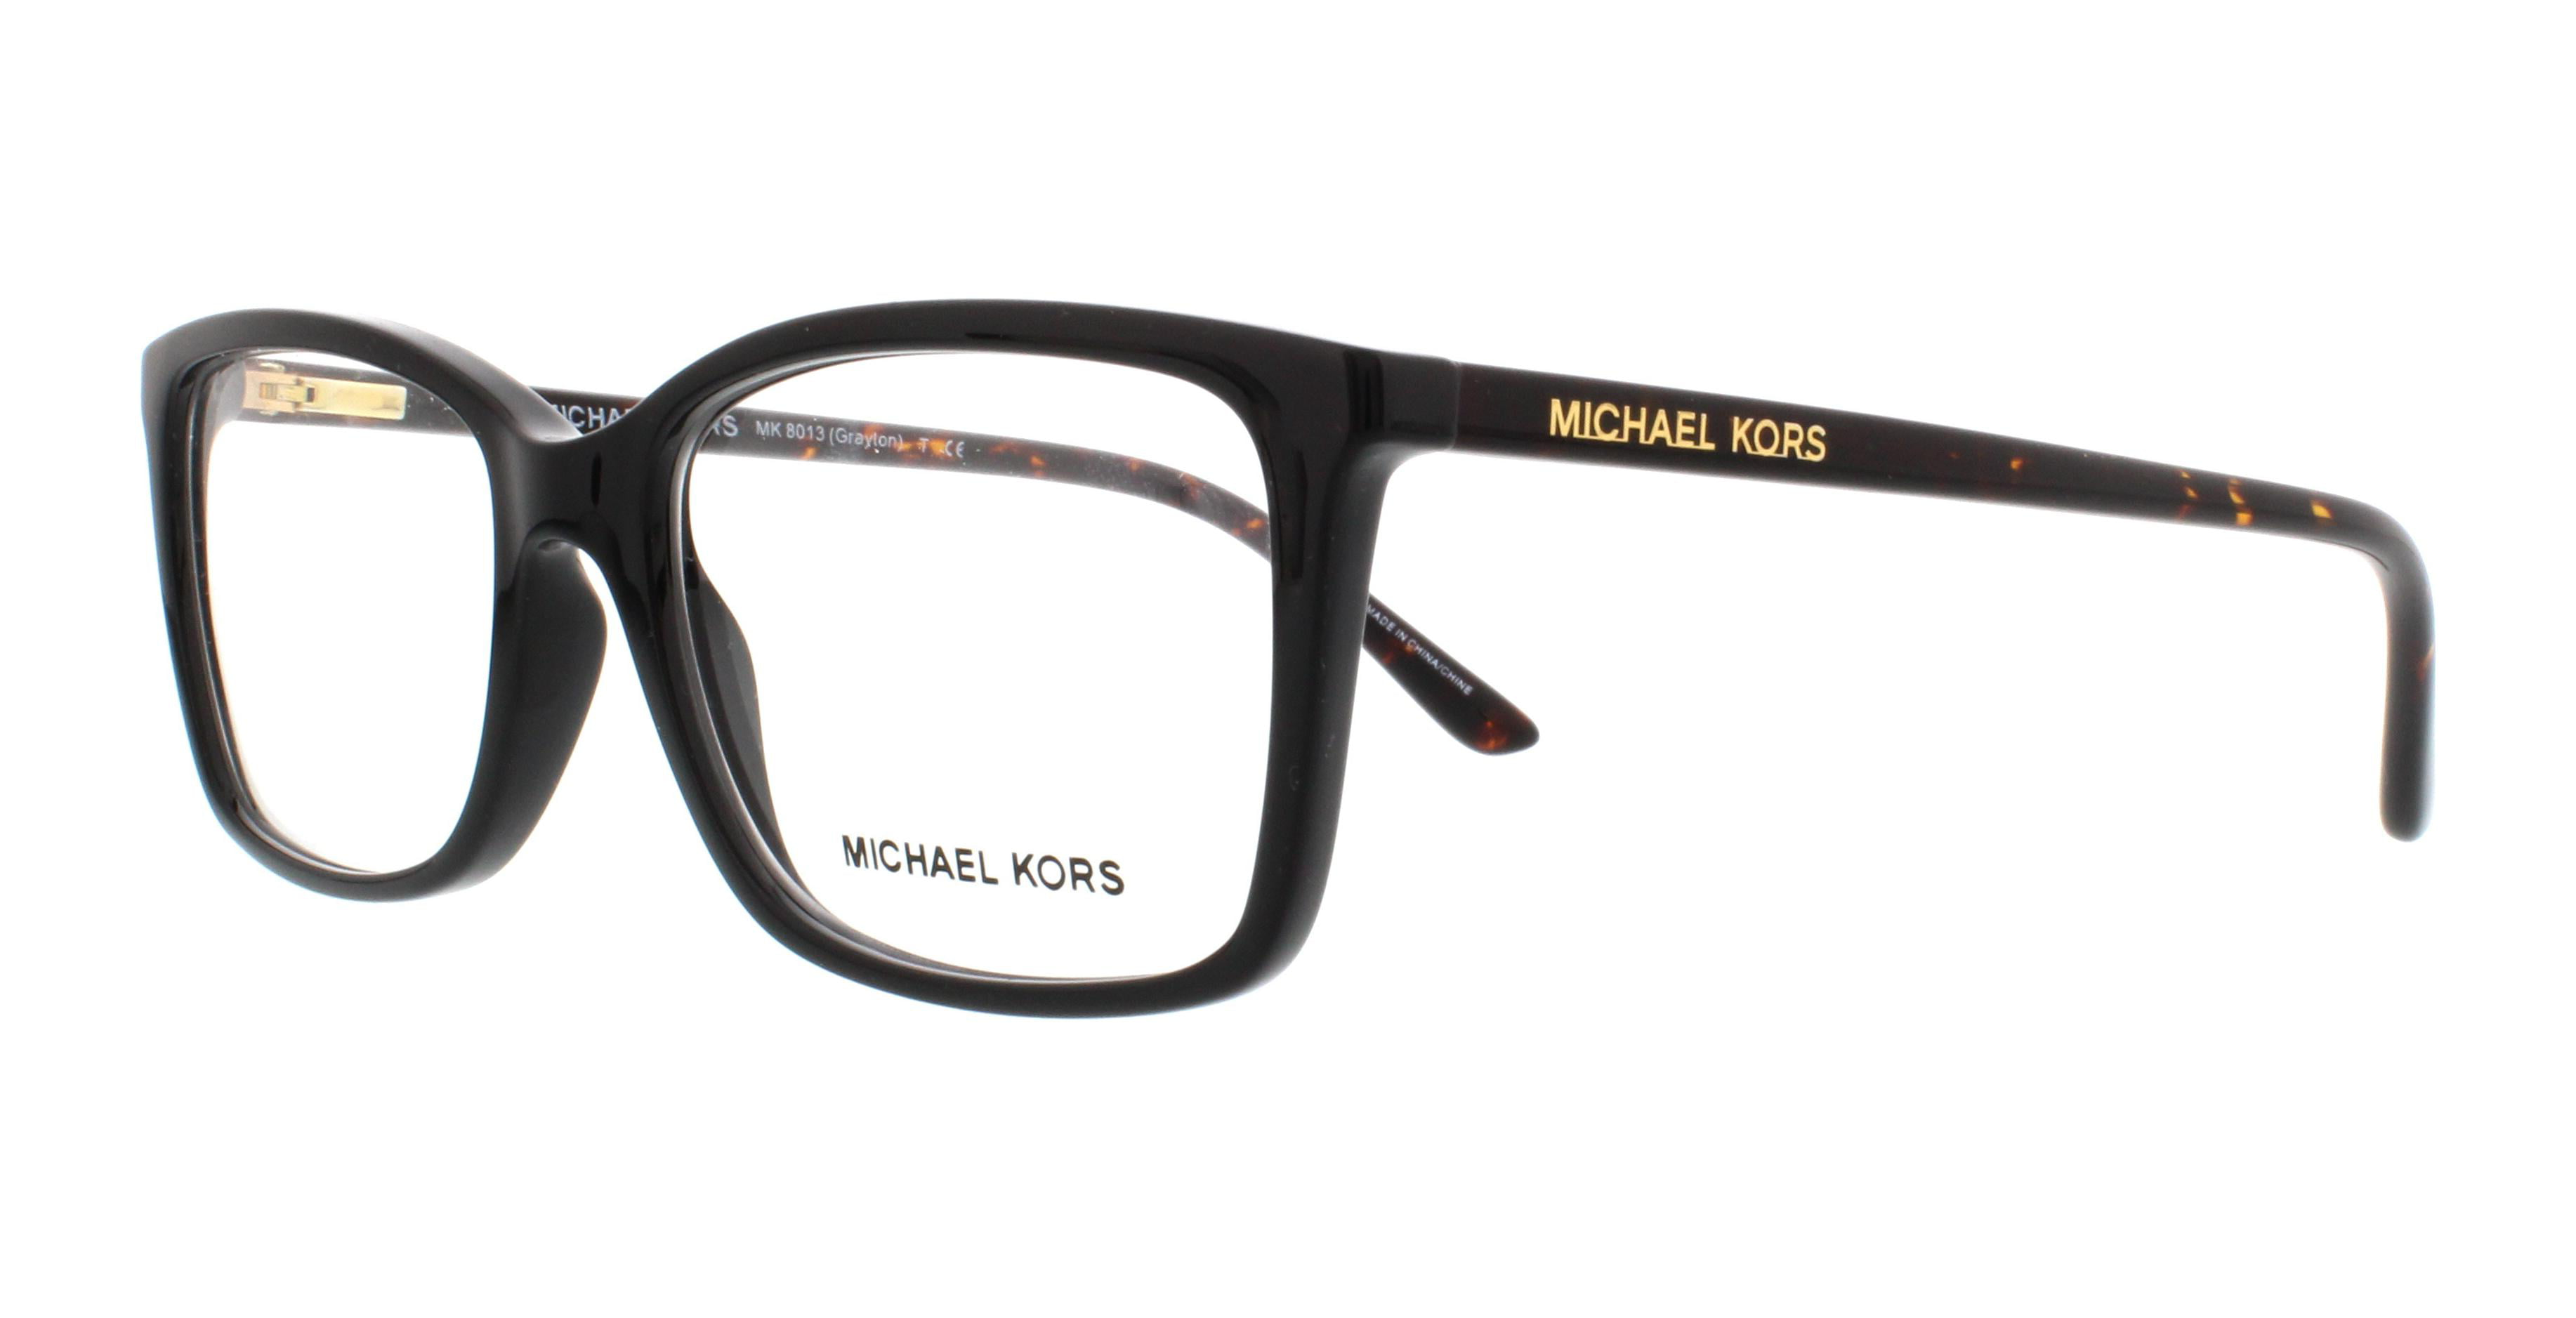 97692f6c116 MICHAEL KORS Eyeglasses MK 8013 3056 Black Tortoise 53MM - Walmart.com